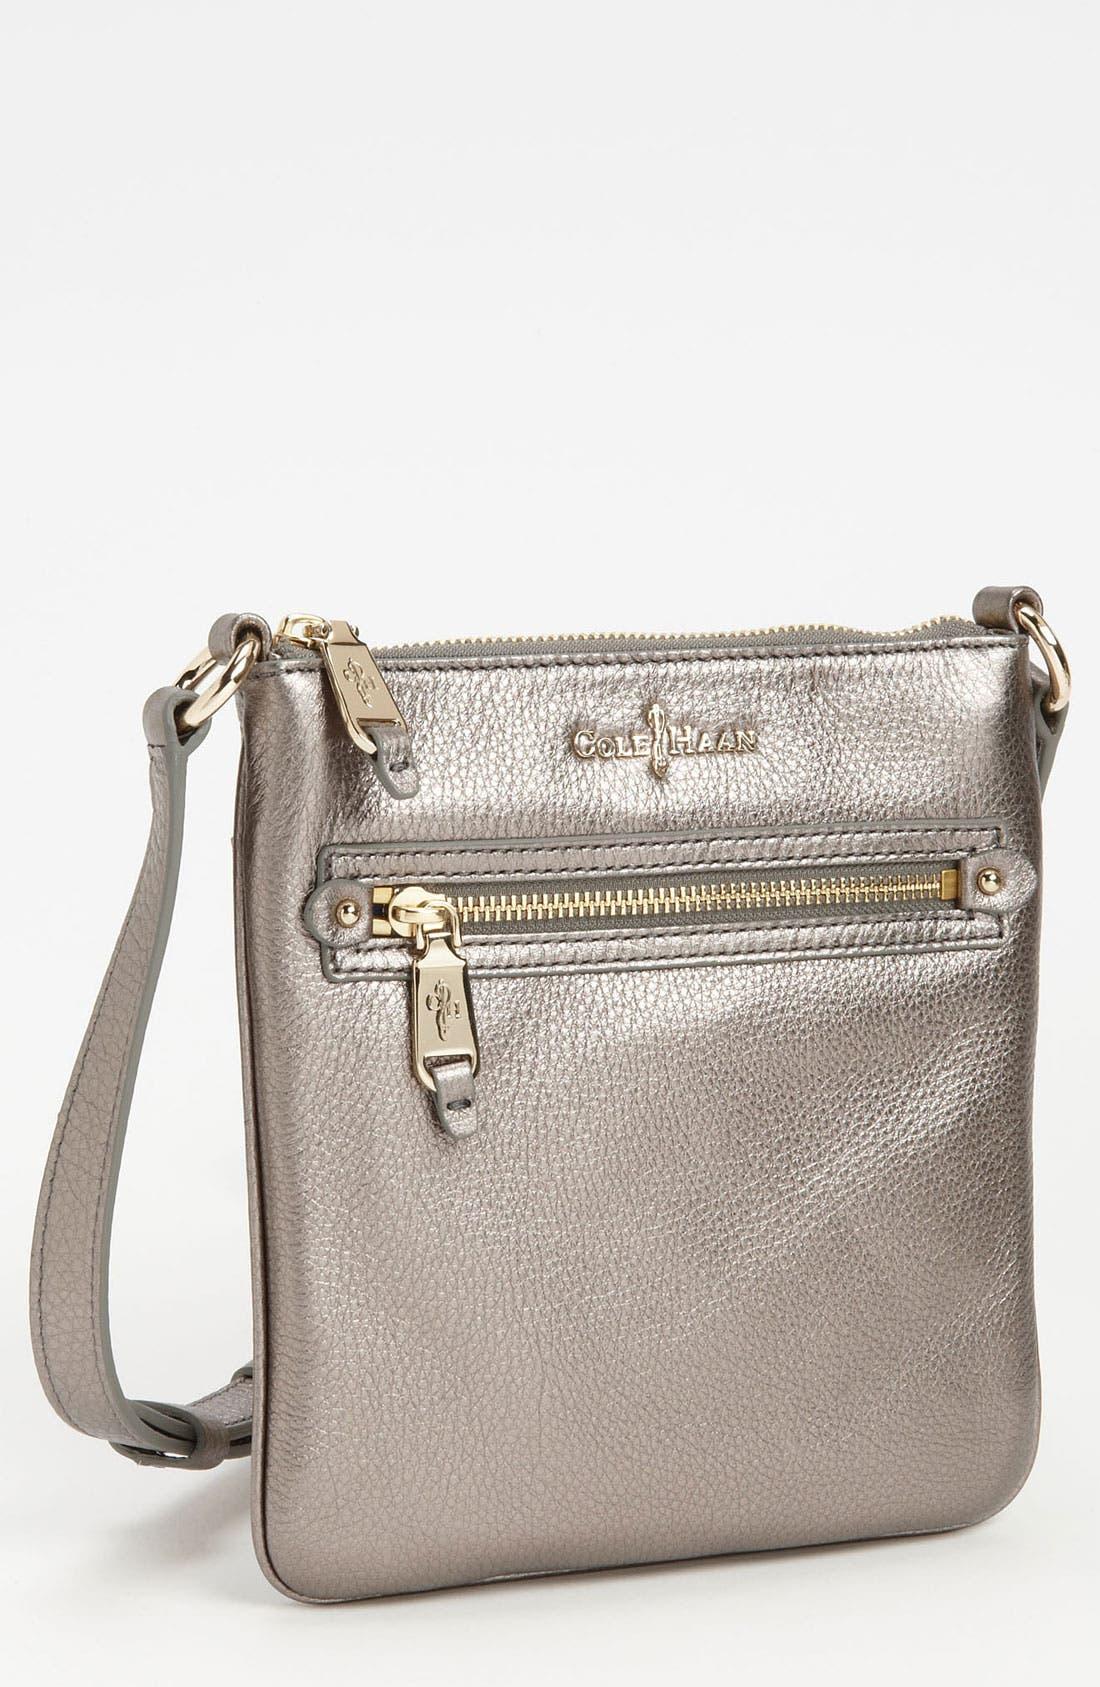 Main Image - Cole Haan 'Linley - Swing Pack' Crossbody Bag